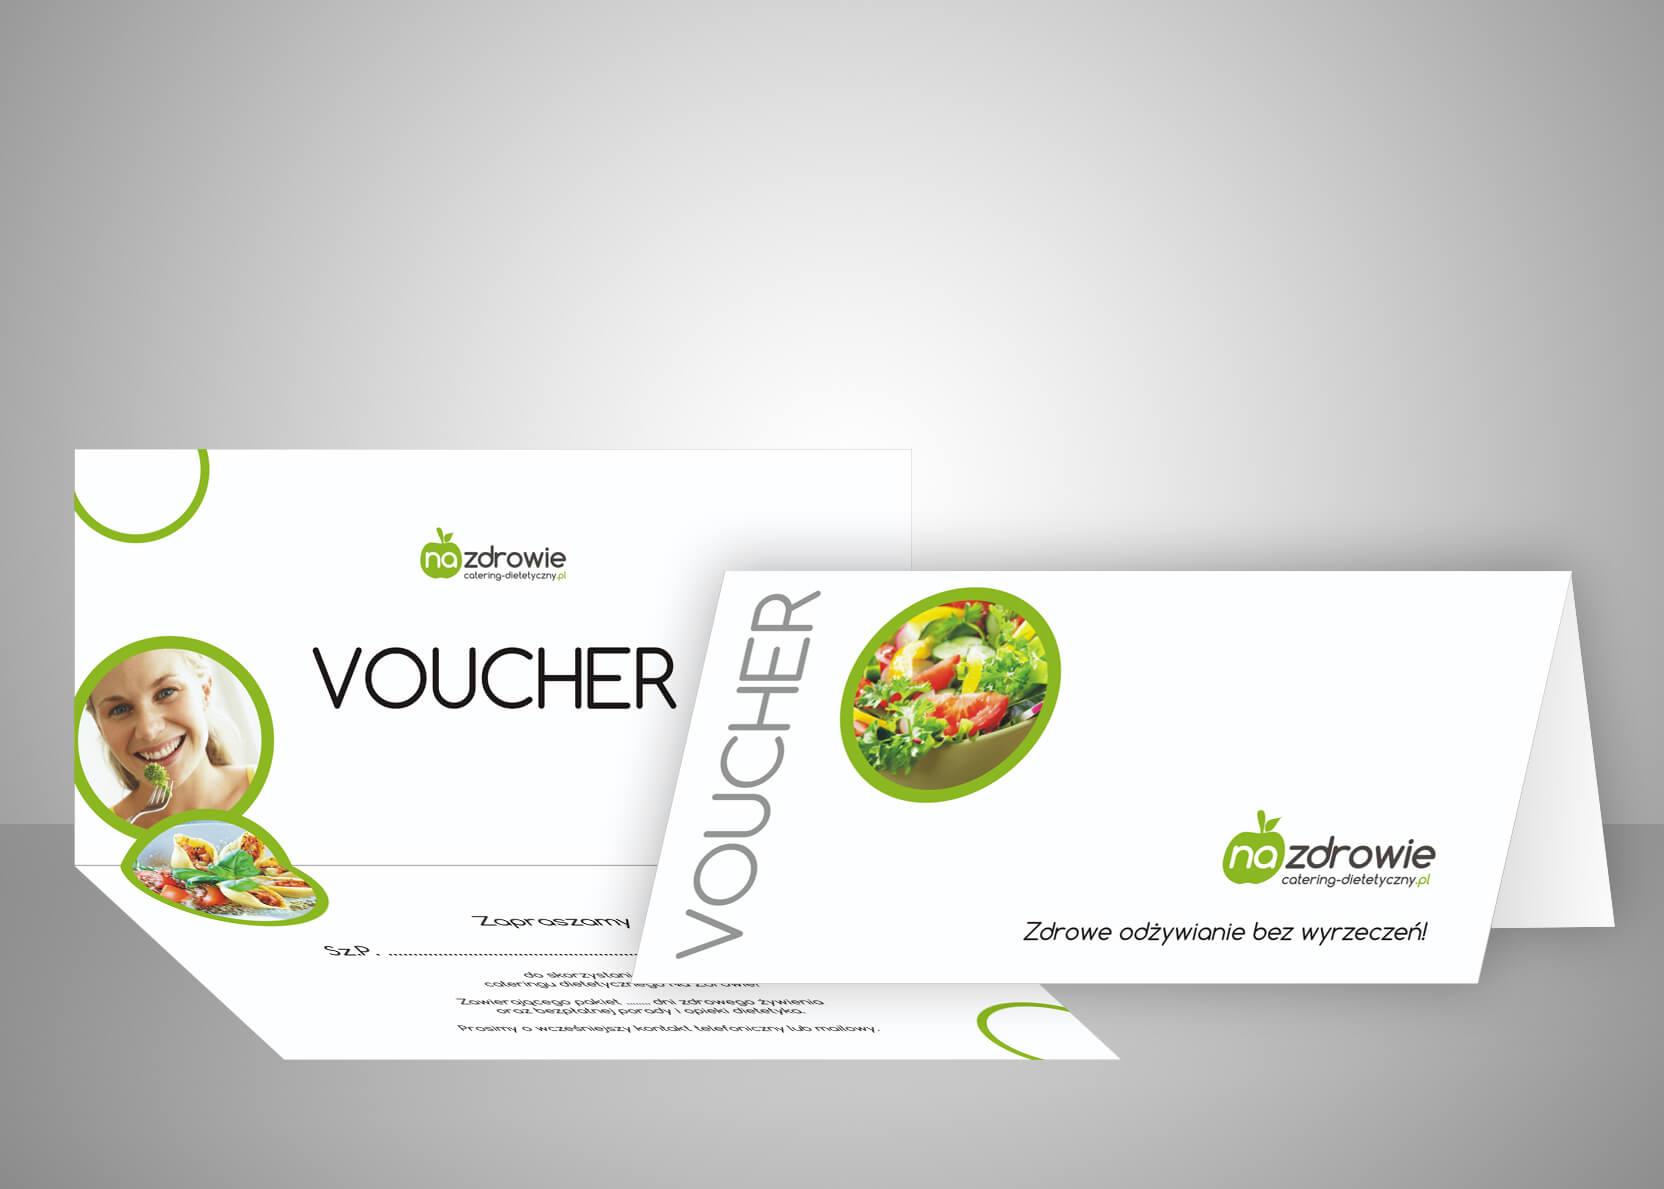 00230 catering dietetyczny voucher